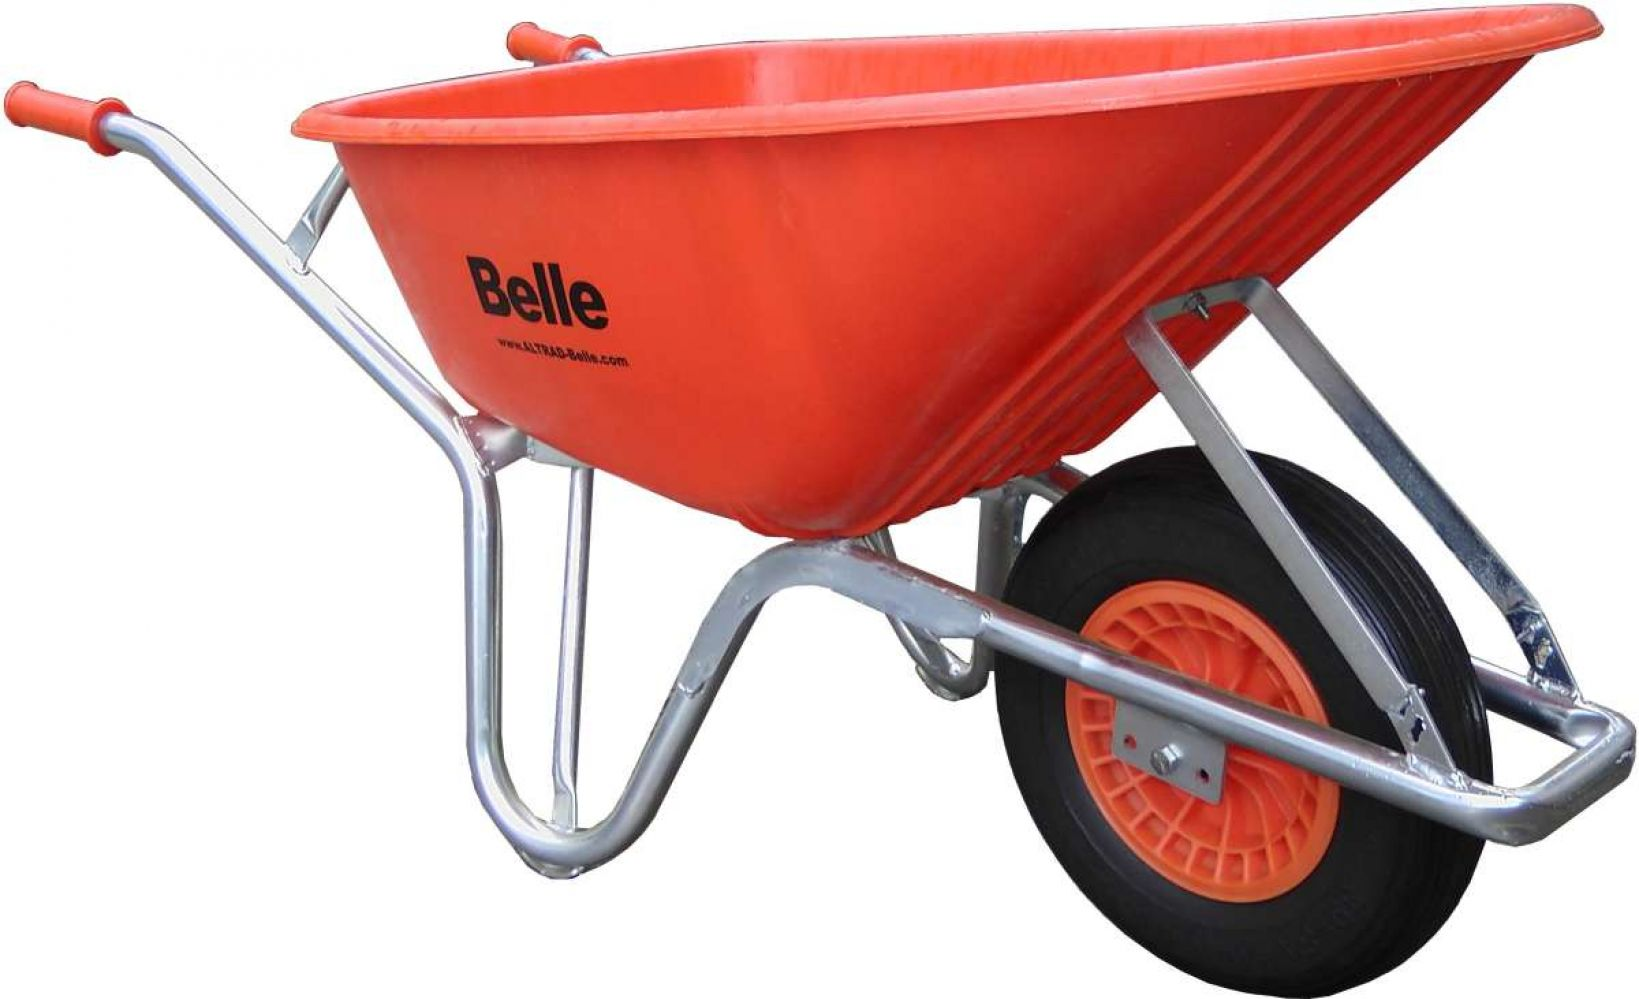 BELLE 02204 Warrior Wheel Barrow